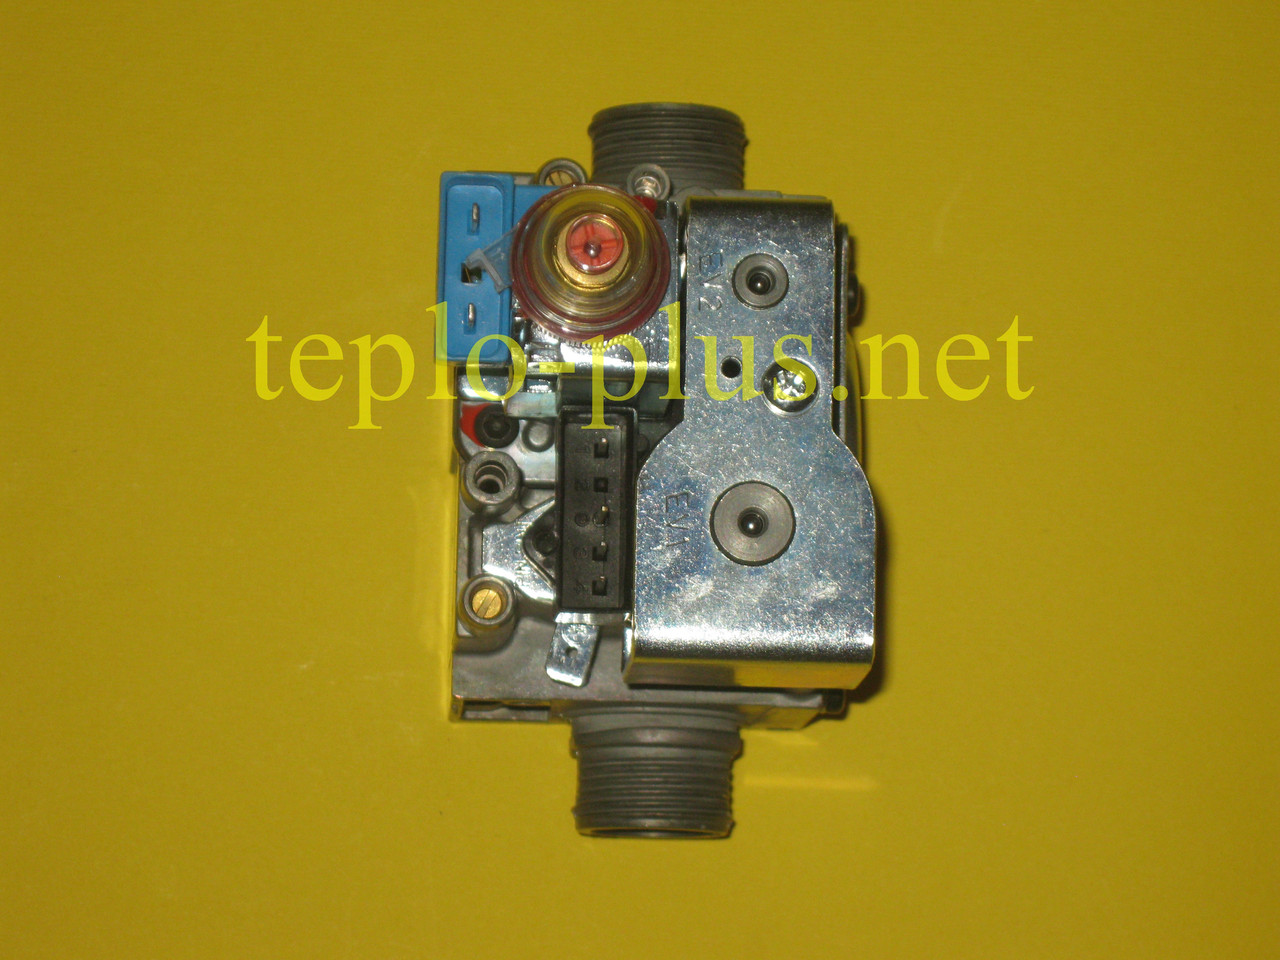 Газовый клапан D003200006 (3003200618) Demrad Aden, Solaris, Tayros, Kalisto, Atron, Nepto, Nitron, Adonis